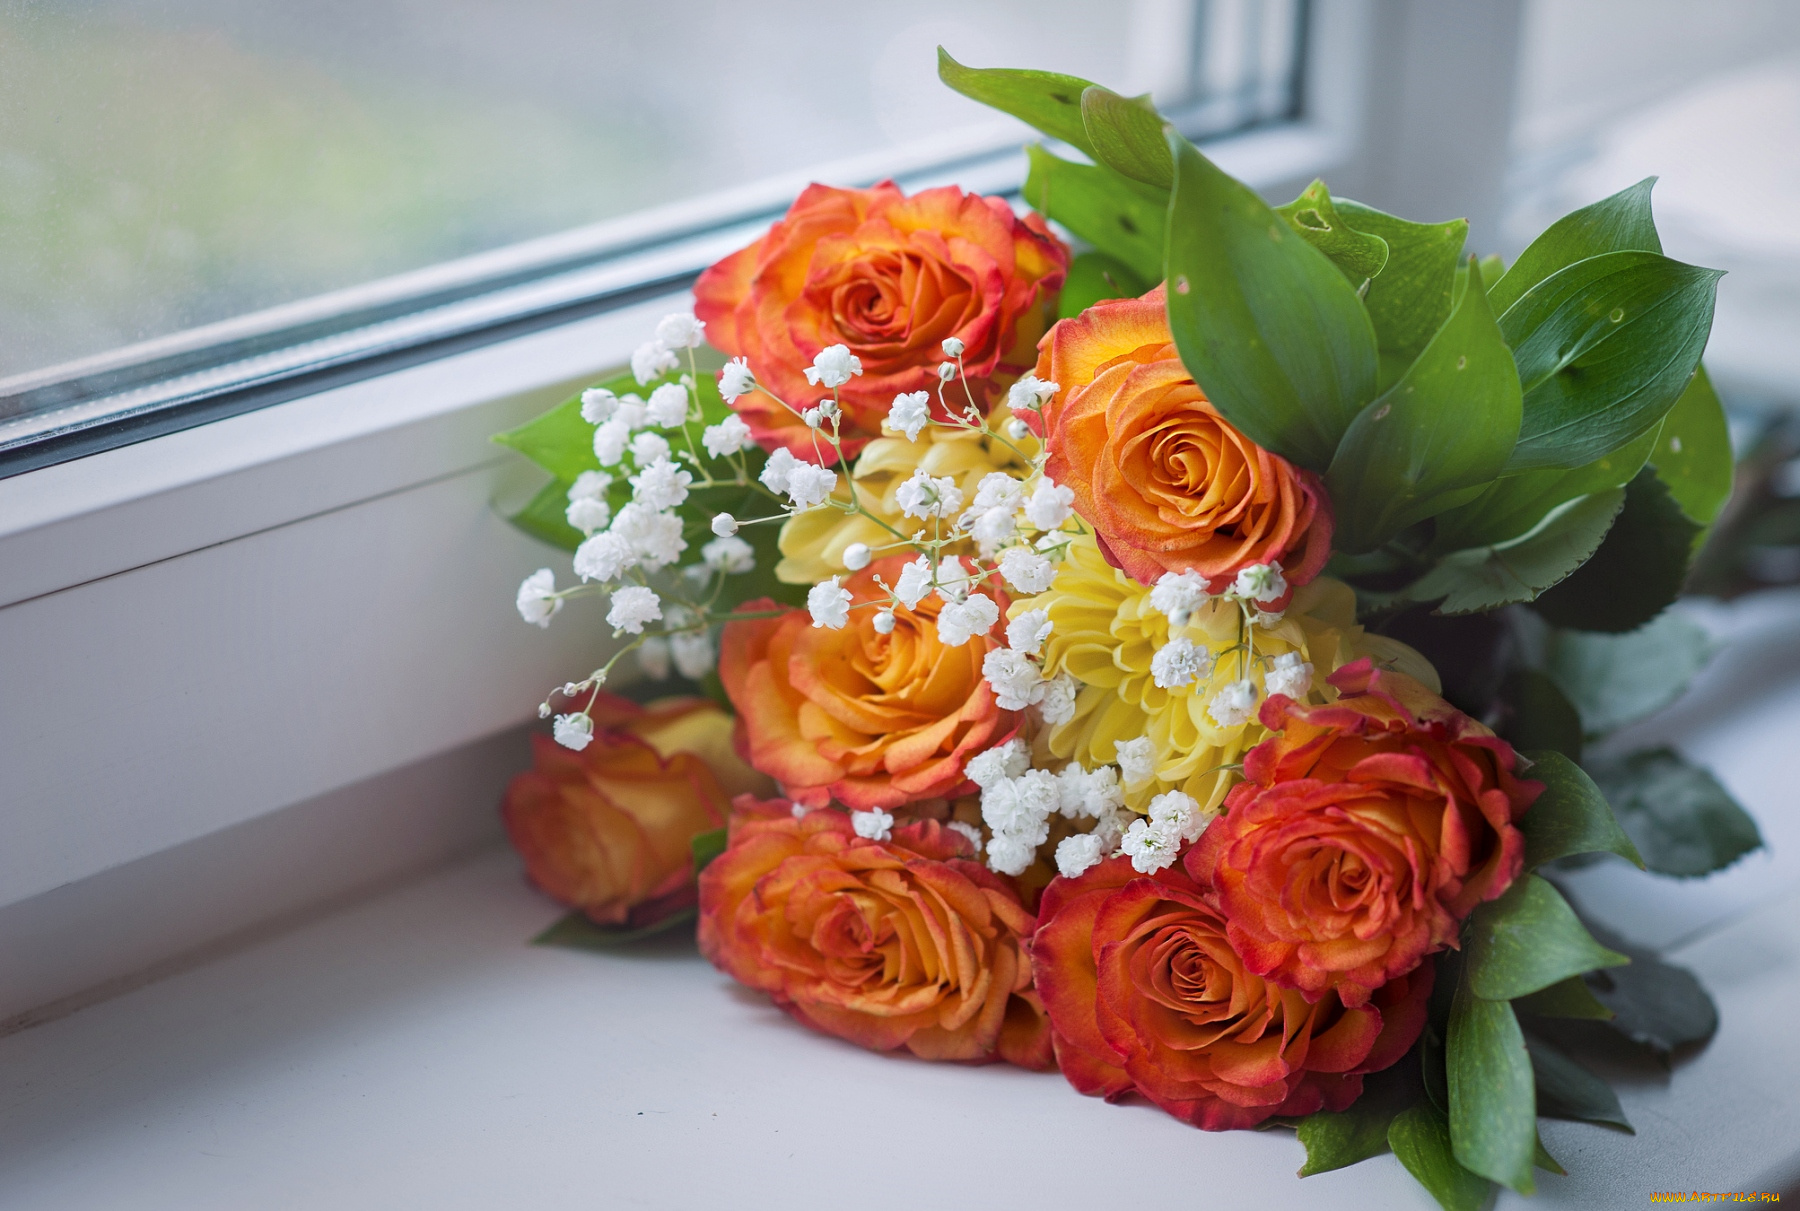 Цветов, букет цветов фото дома